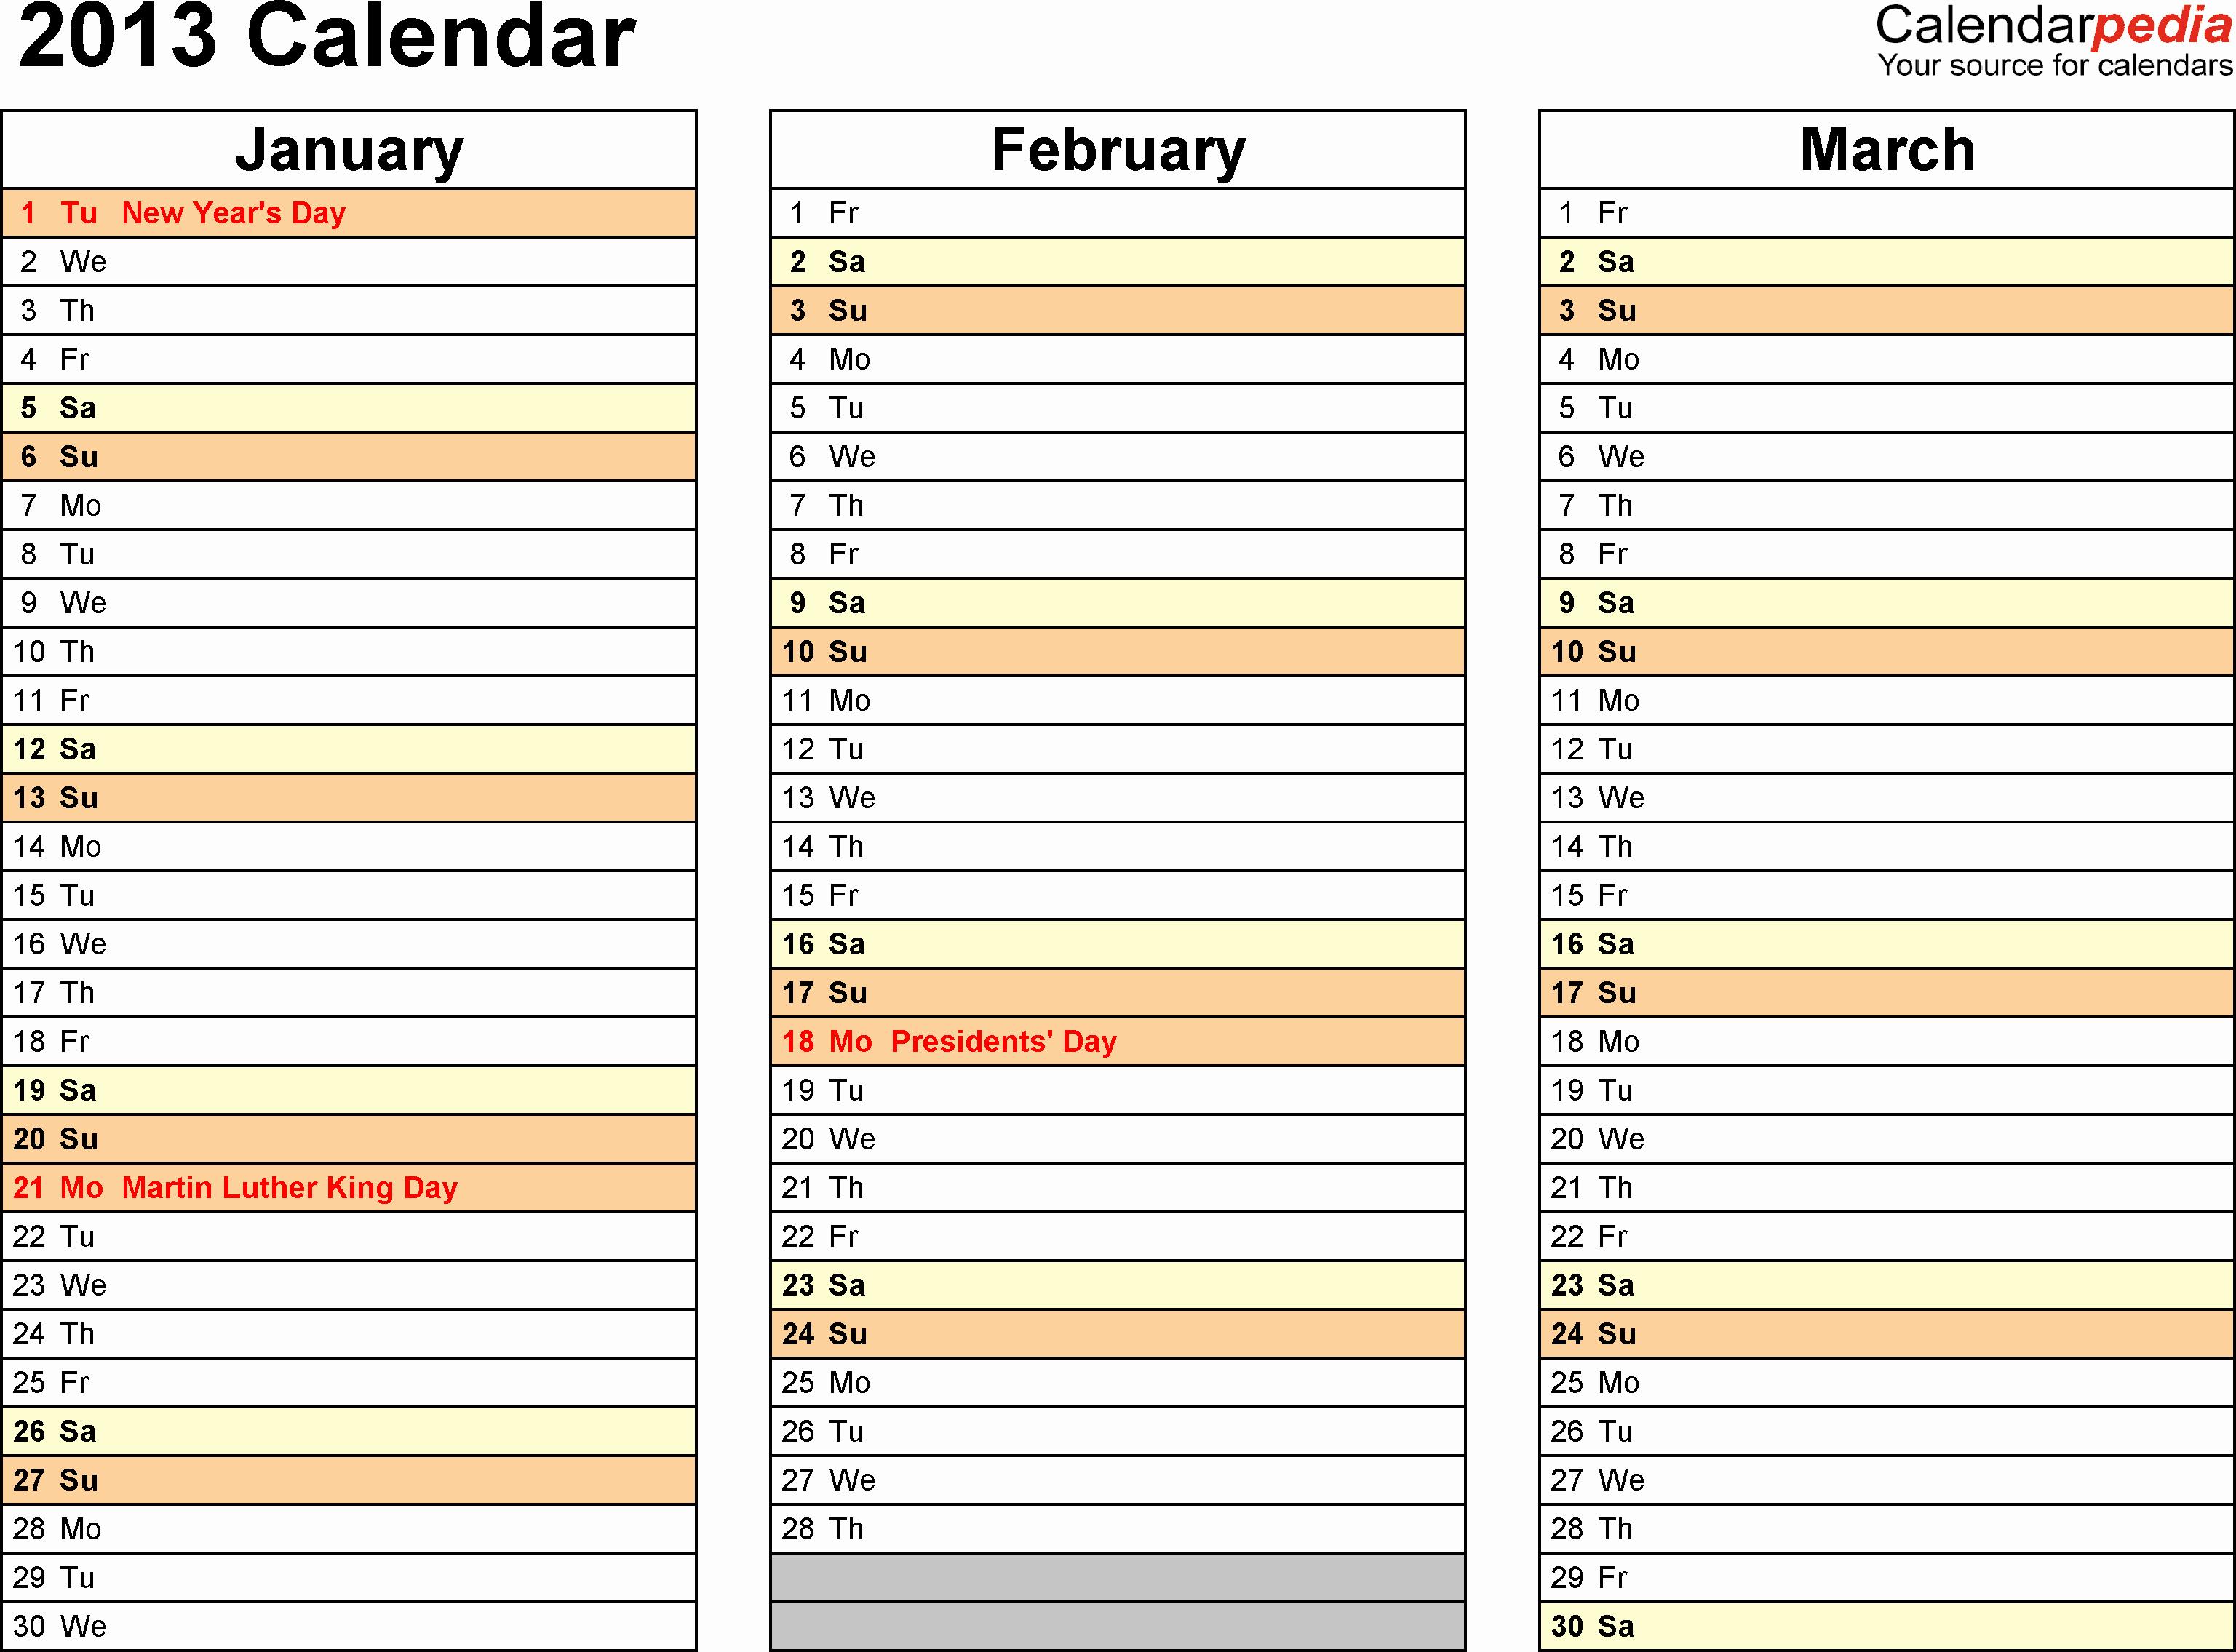 Monthly Calendar Template 2013